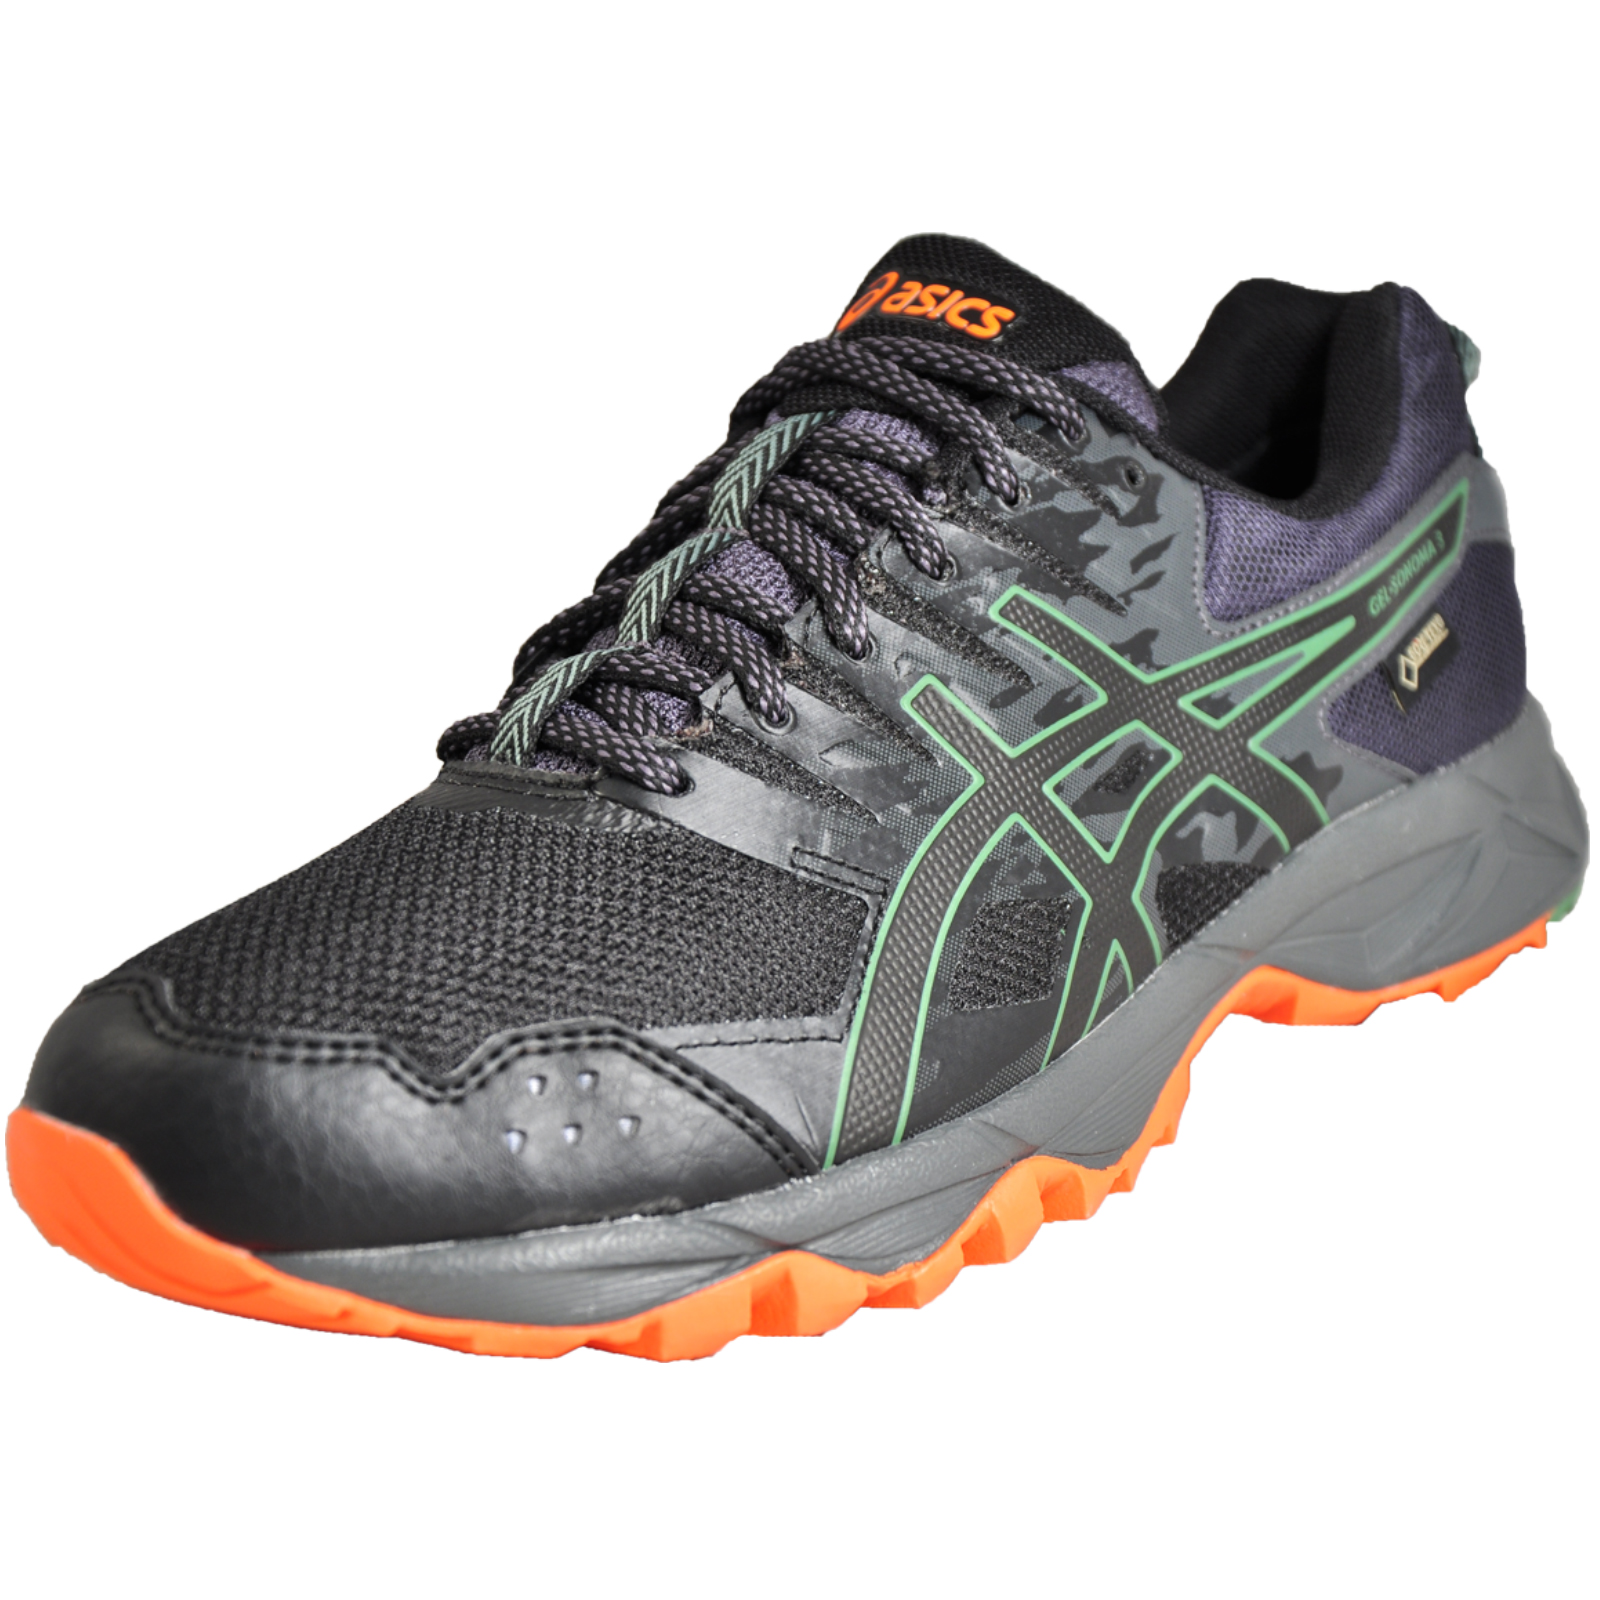 Details about Asics Gel Sonoma 3 GTX Gore-Tex Men s Waterproof All Terrain  Trail Running Shoes 51260a600d7